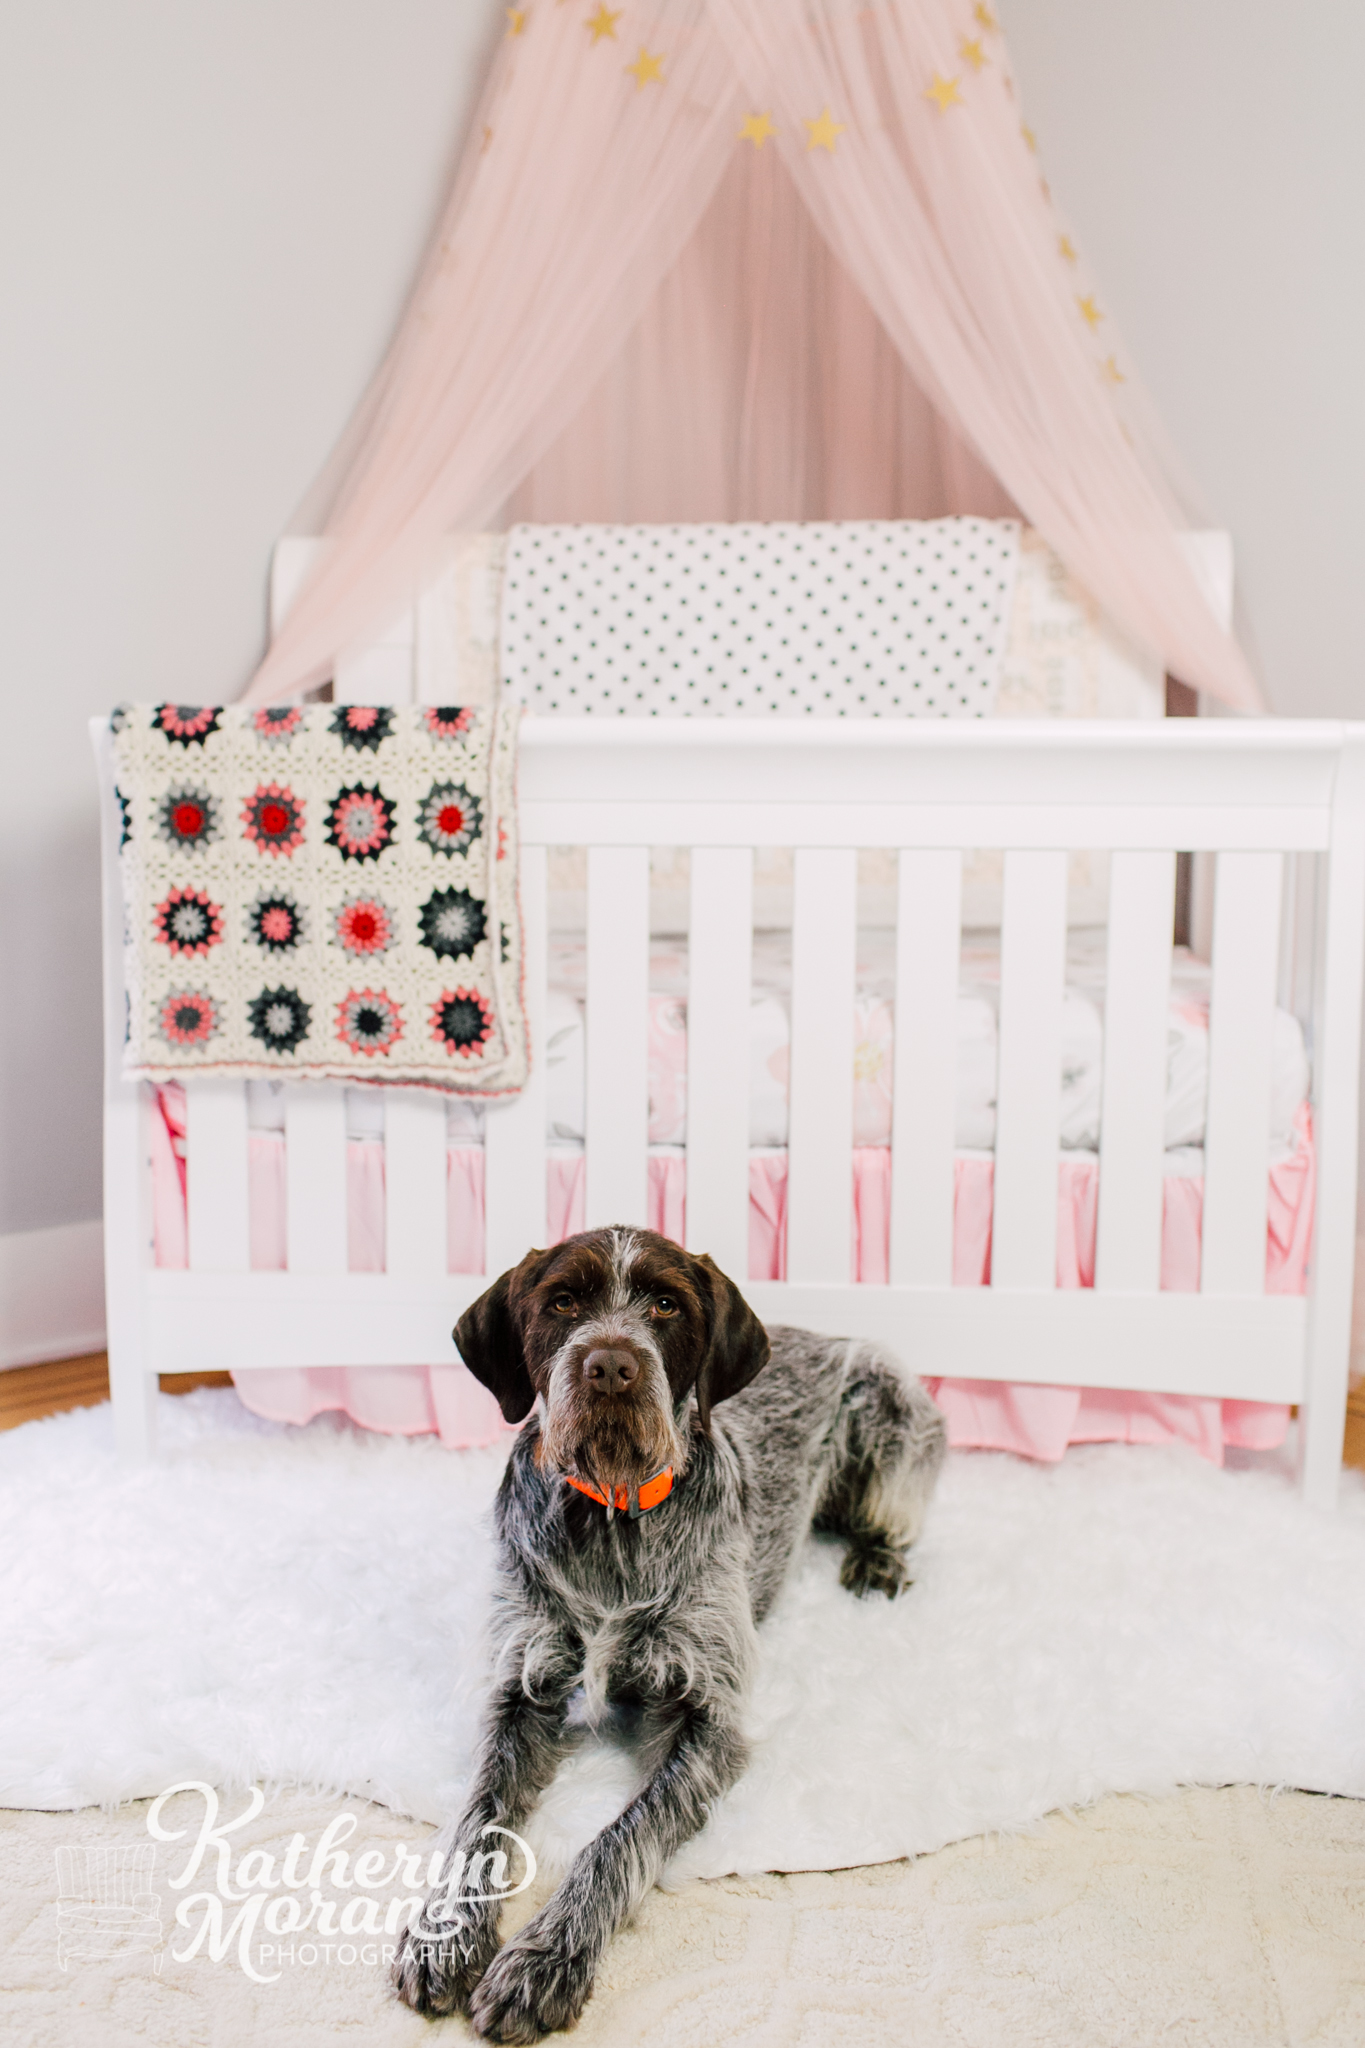 seattle-newborn-photographer-katheryn-moran-avery-malaspino-4-2.jpg